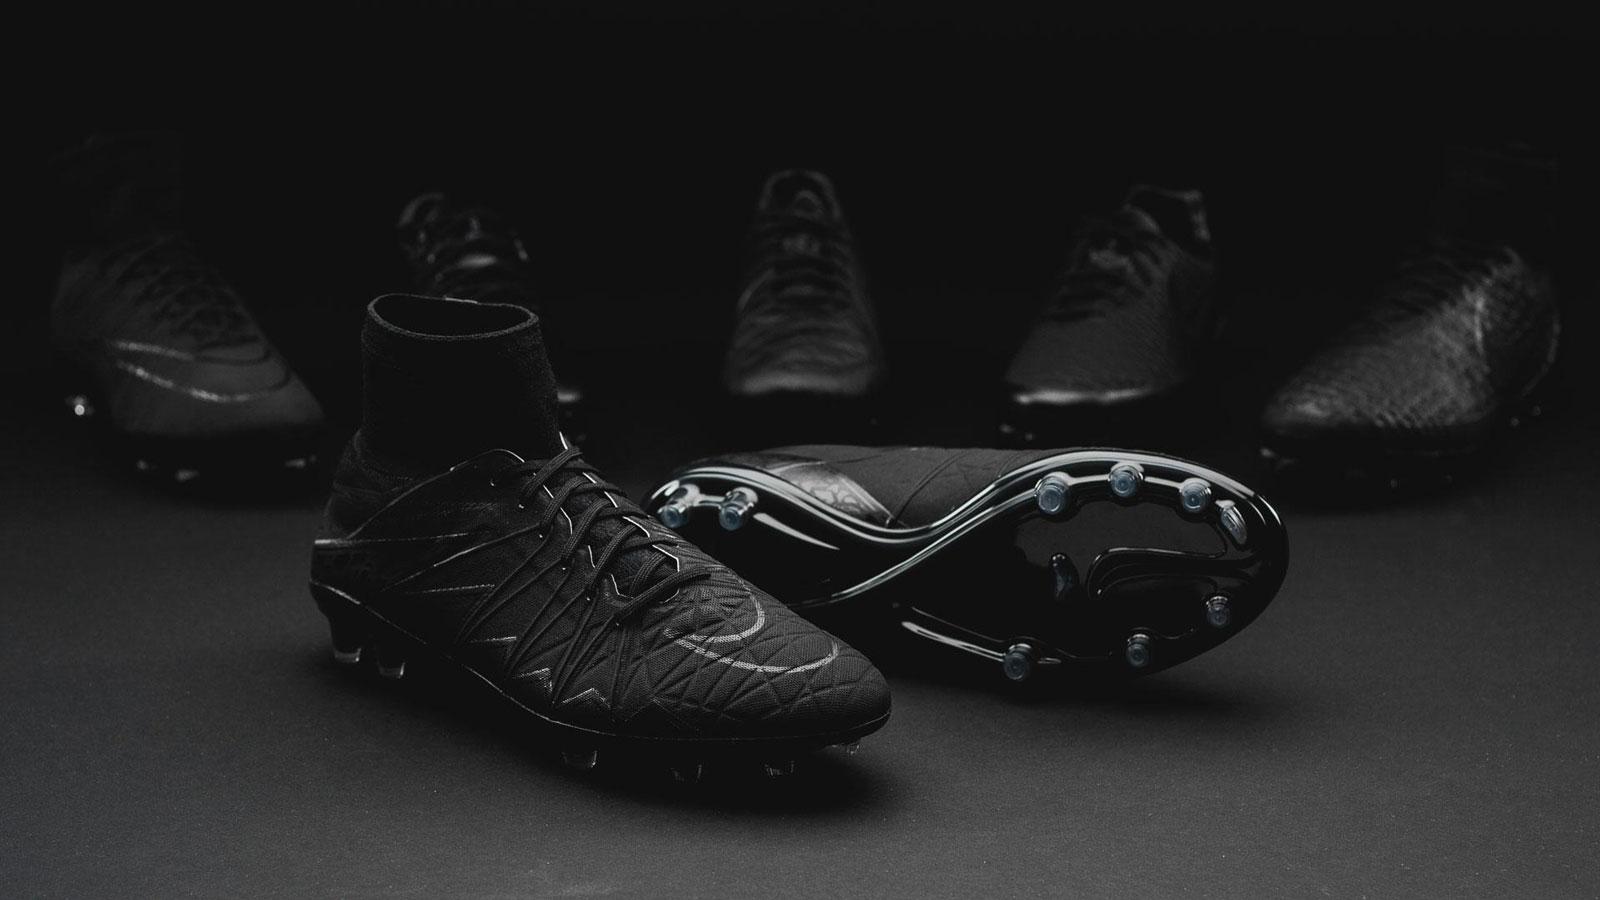 e17637c2f ... Blackout Nike Hypervenom Phantom 2 Academy Pack Boots Released - Footy  Headlines